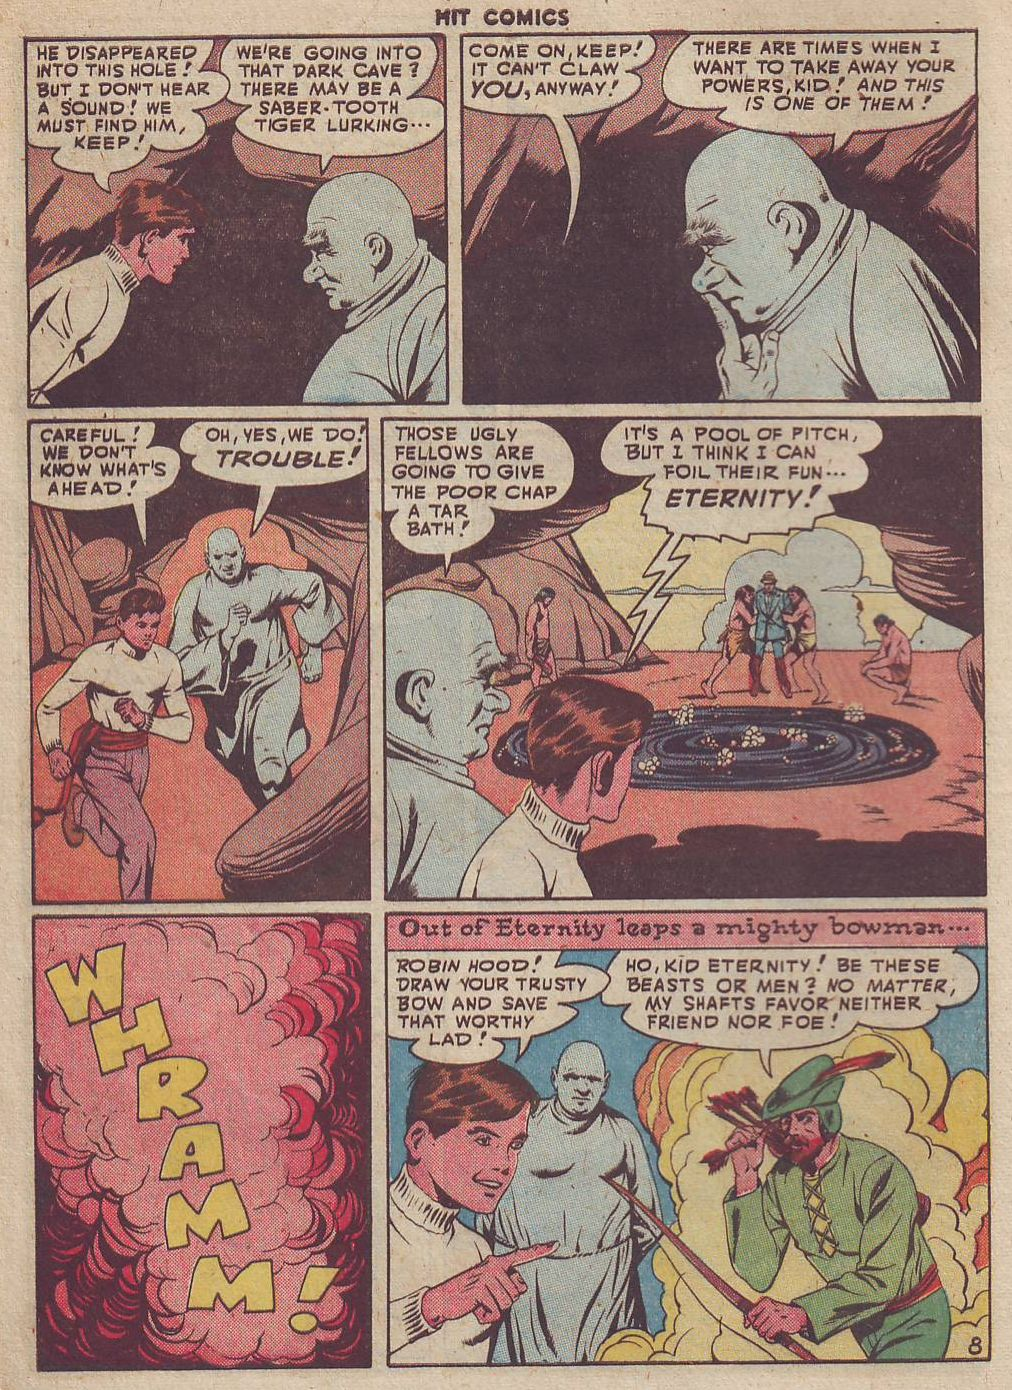 Read online Hit Comics comic -  Issue #51 - 10